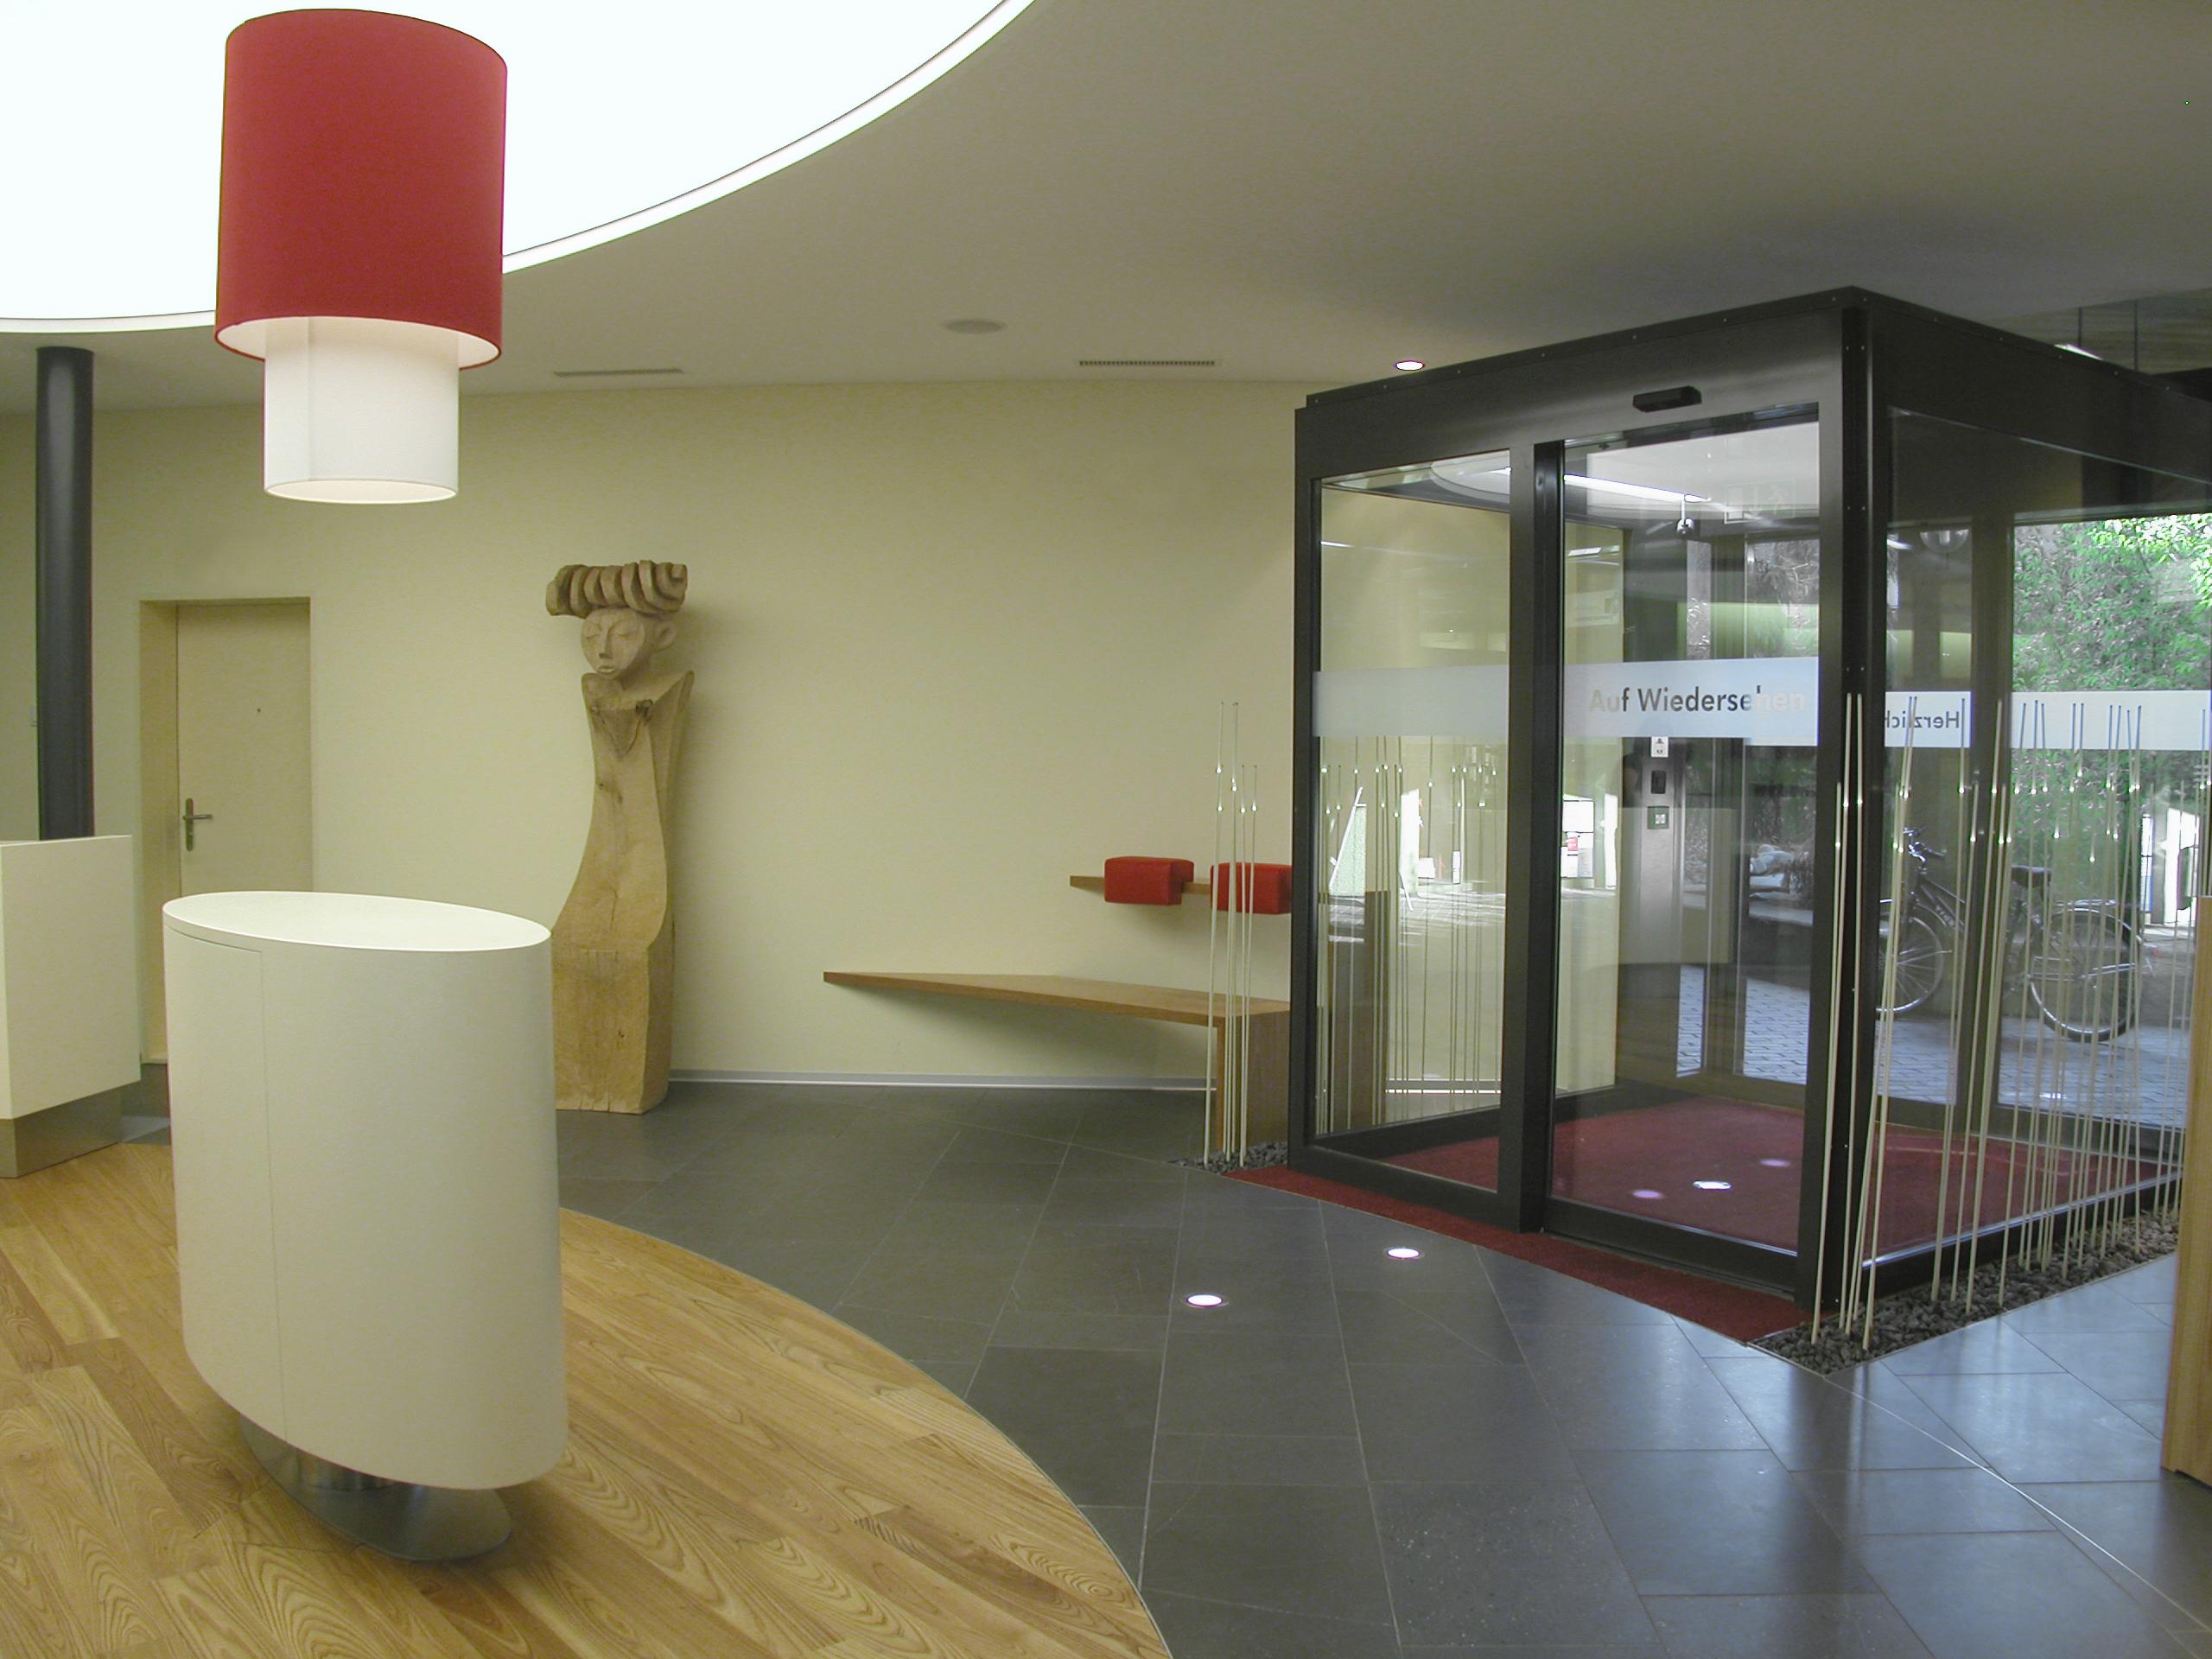 Raiffeisenbank fislisbach innenarchitektur leitgedanke for Design innenarchitektur